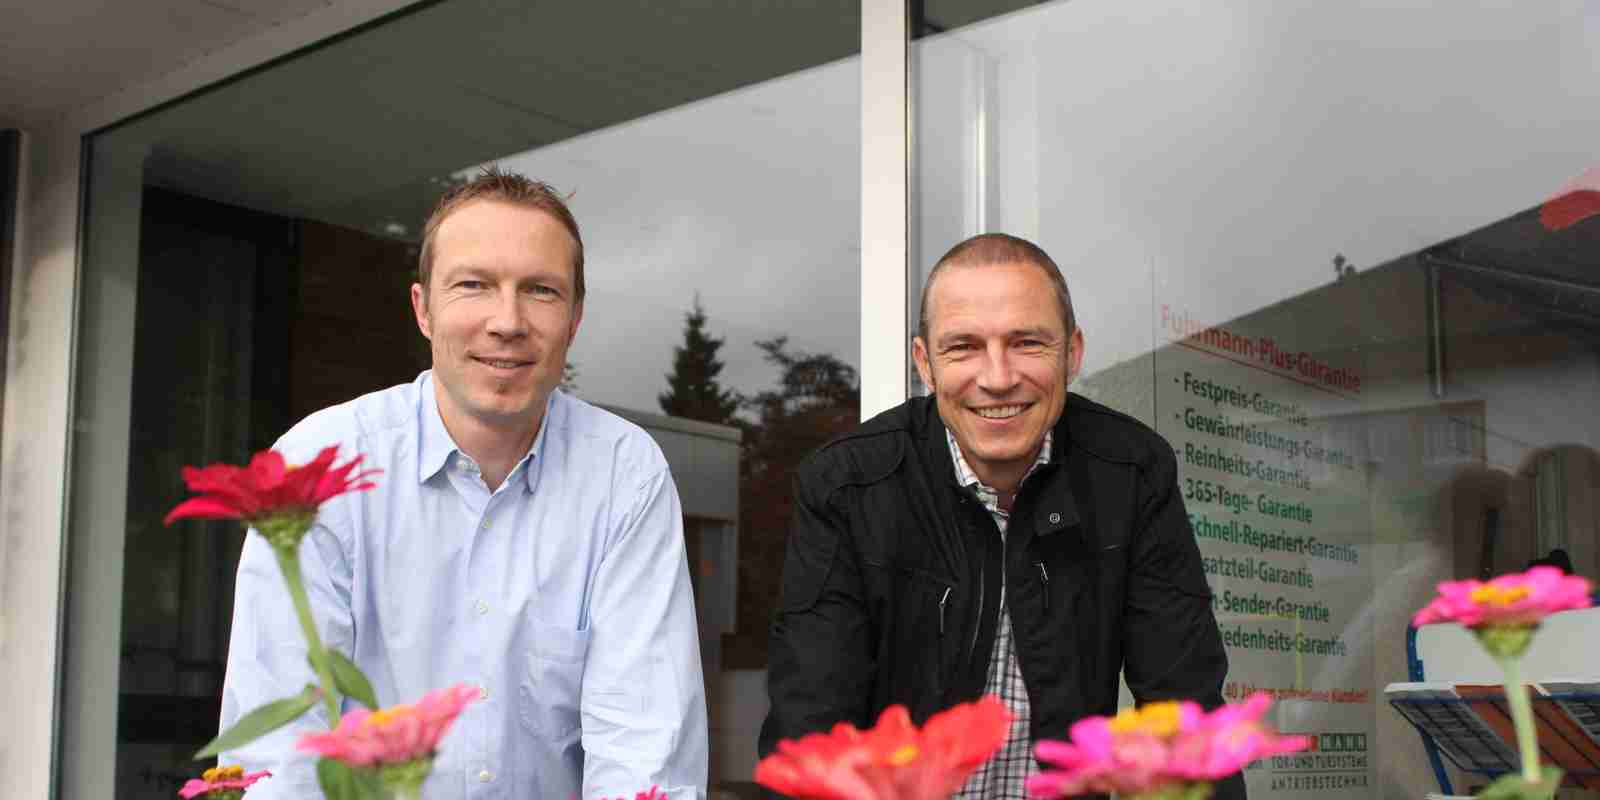 Kai-Peter und FalkoFuhrmann